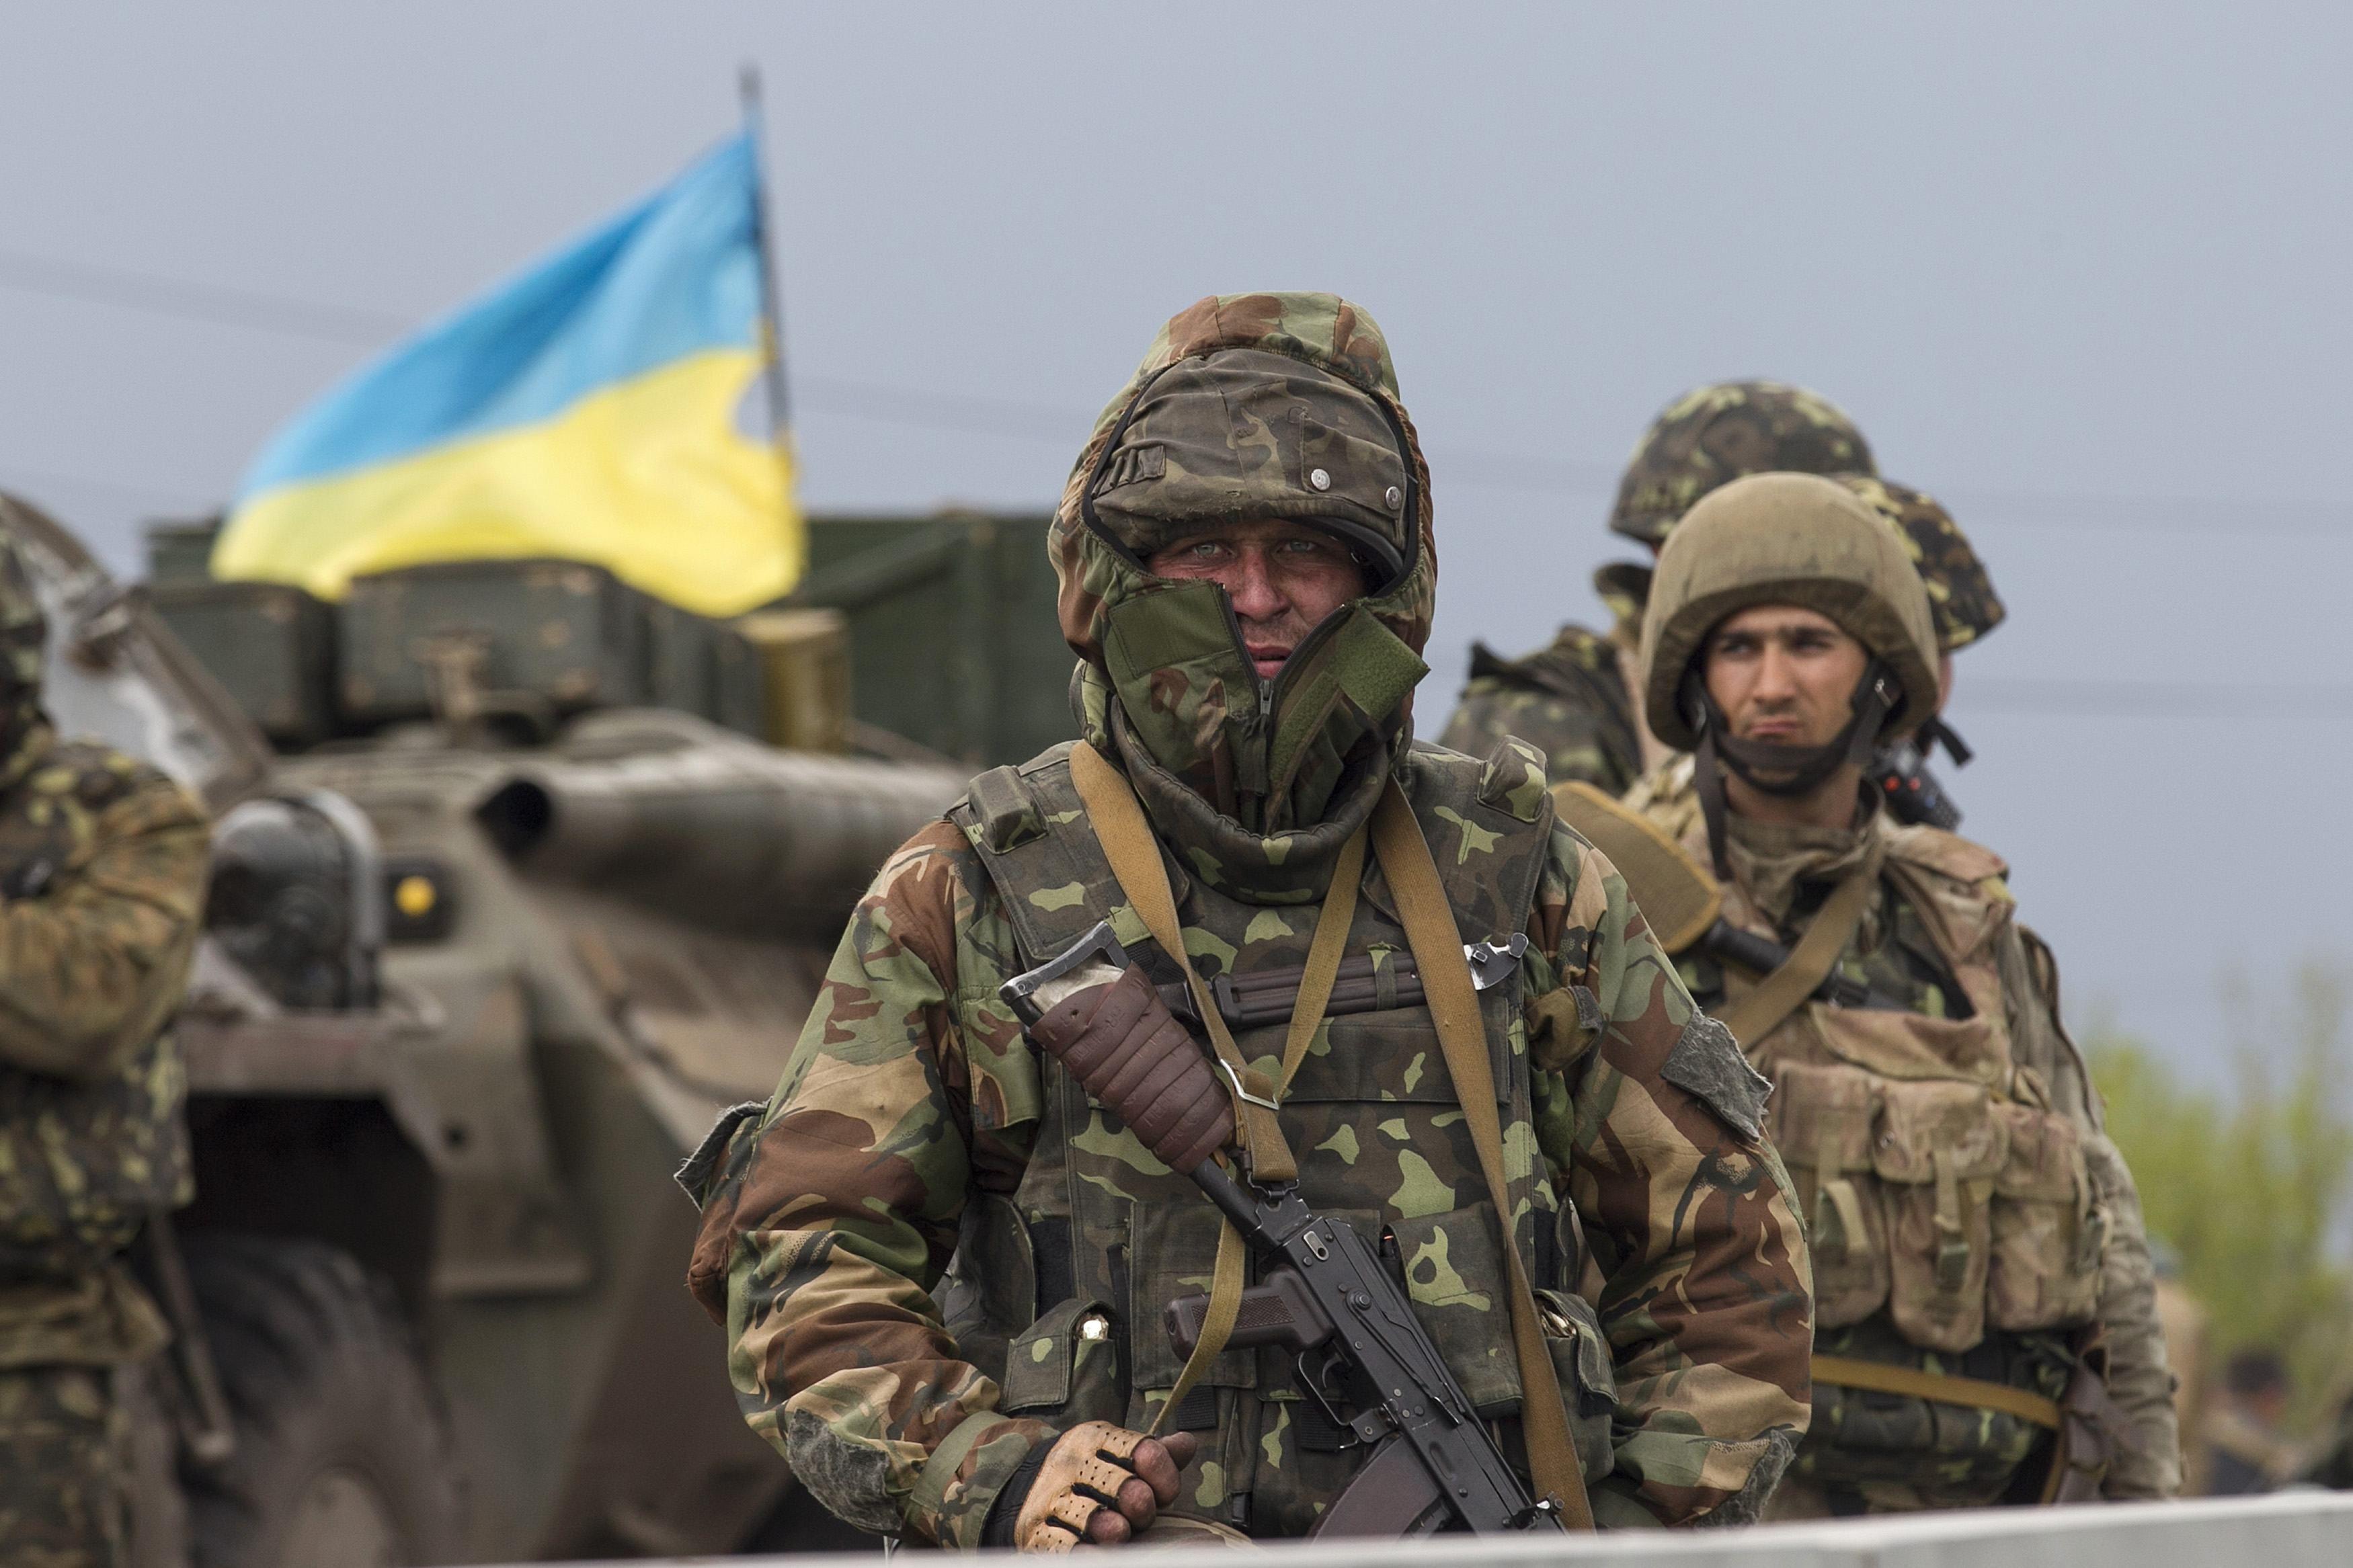 Фото картинки украинской армии